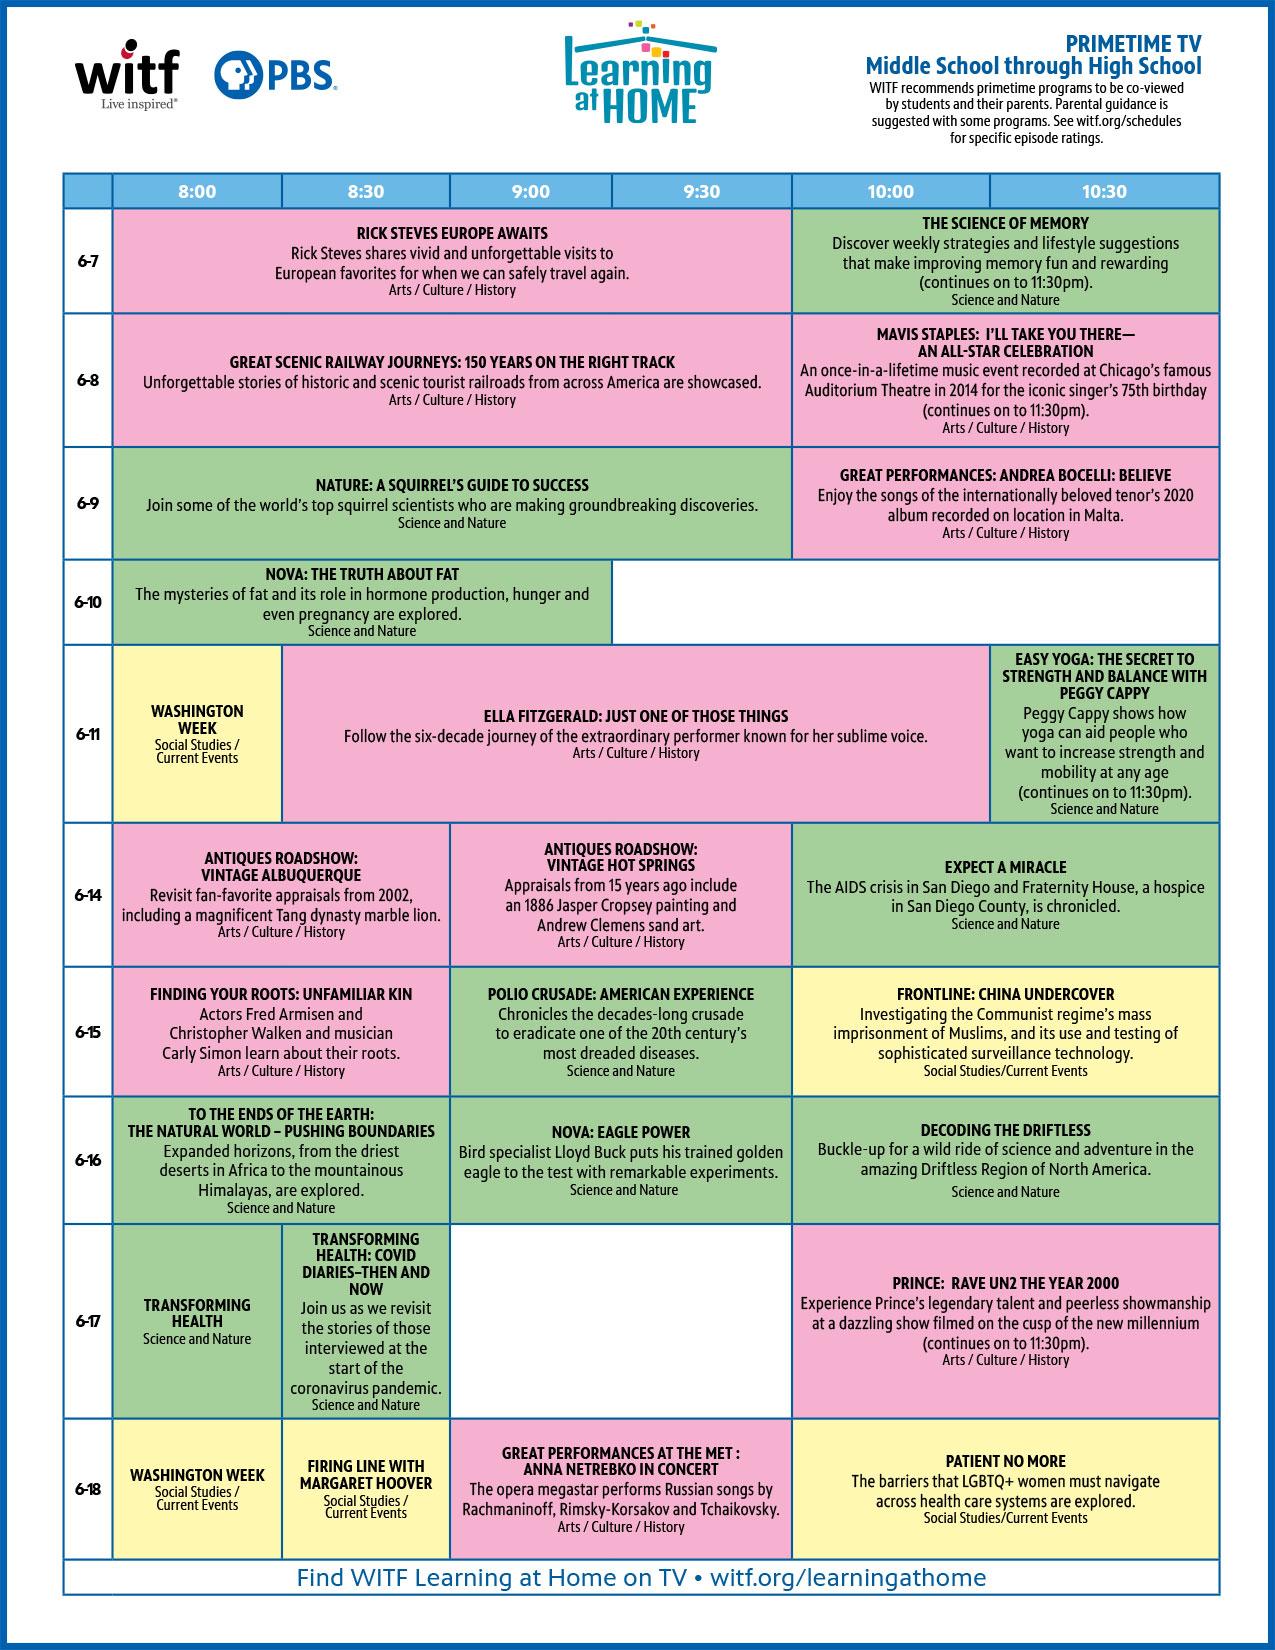 WITF Primetime Schedule | Middle School through High School